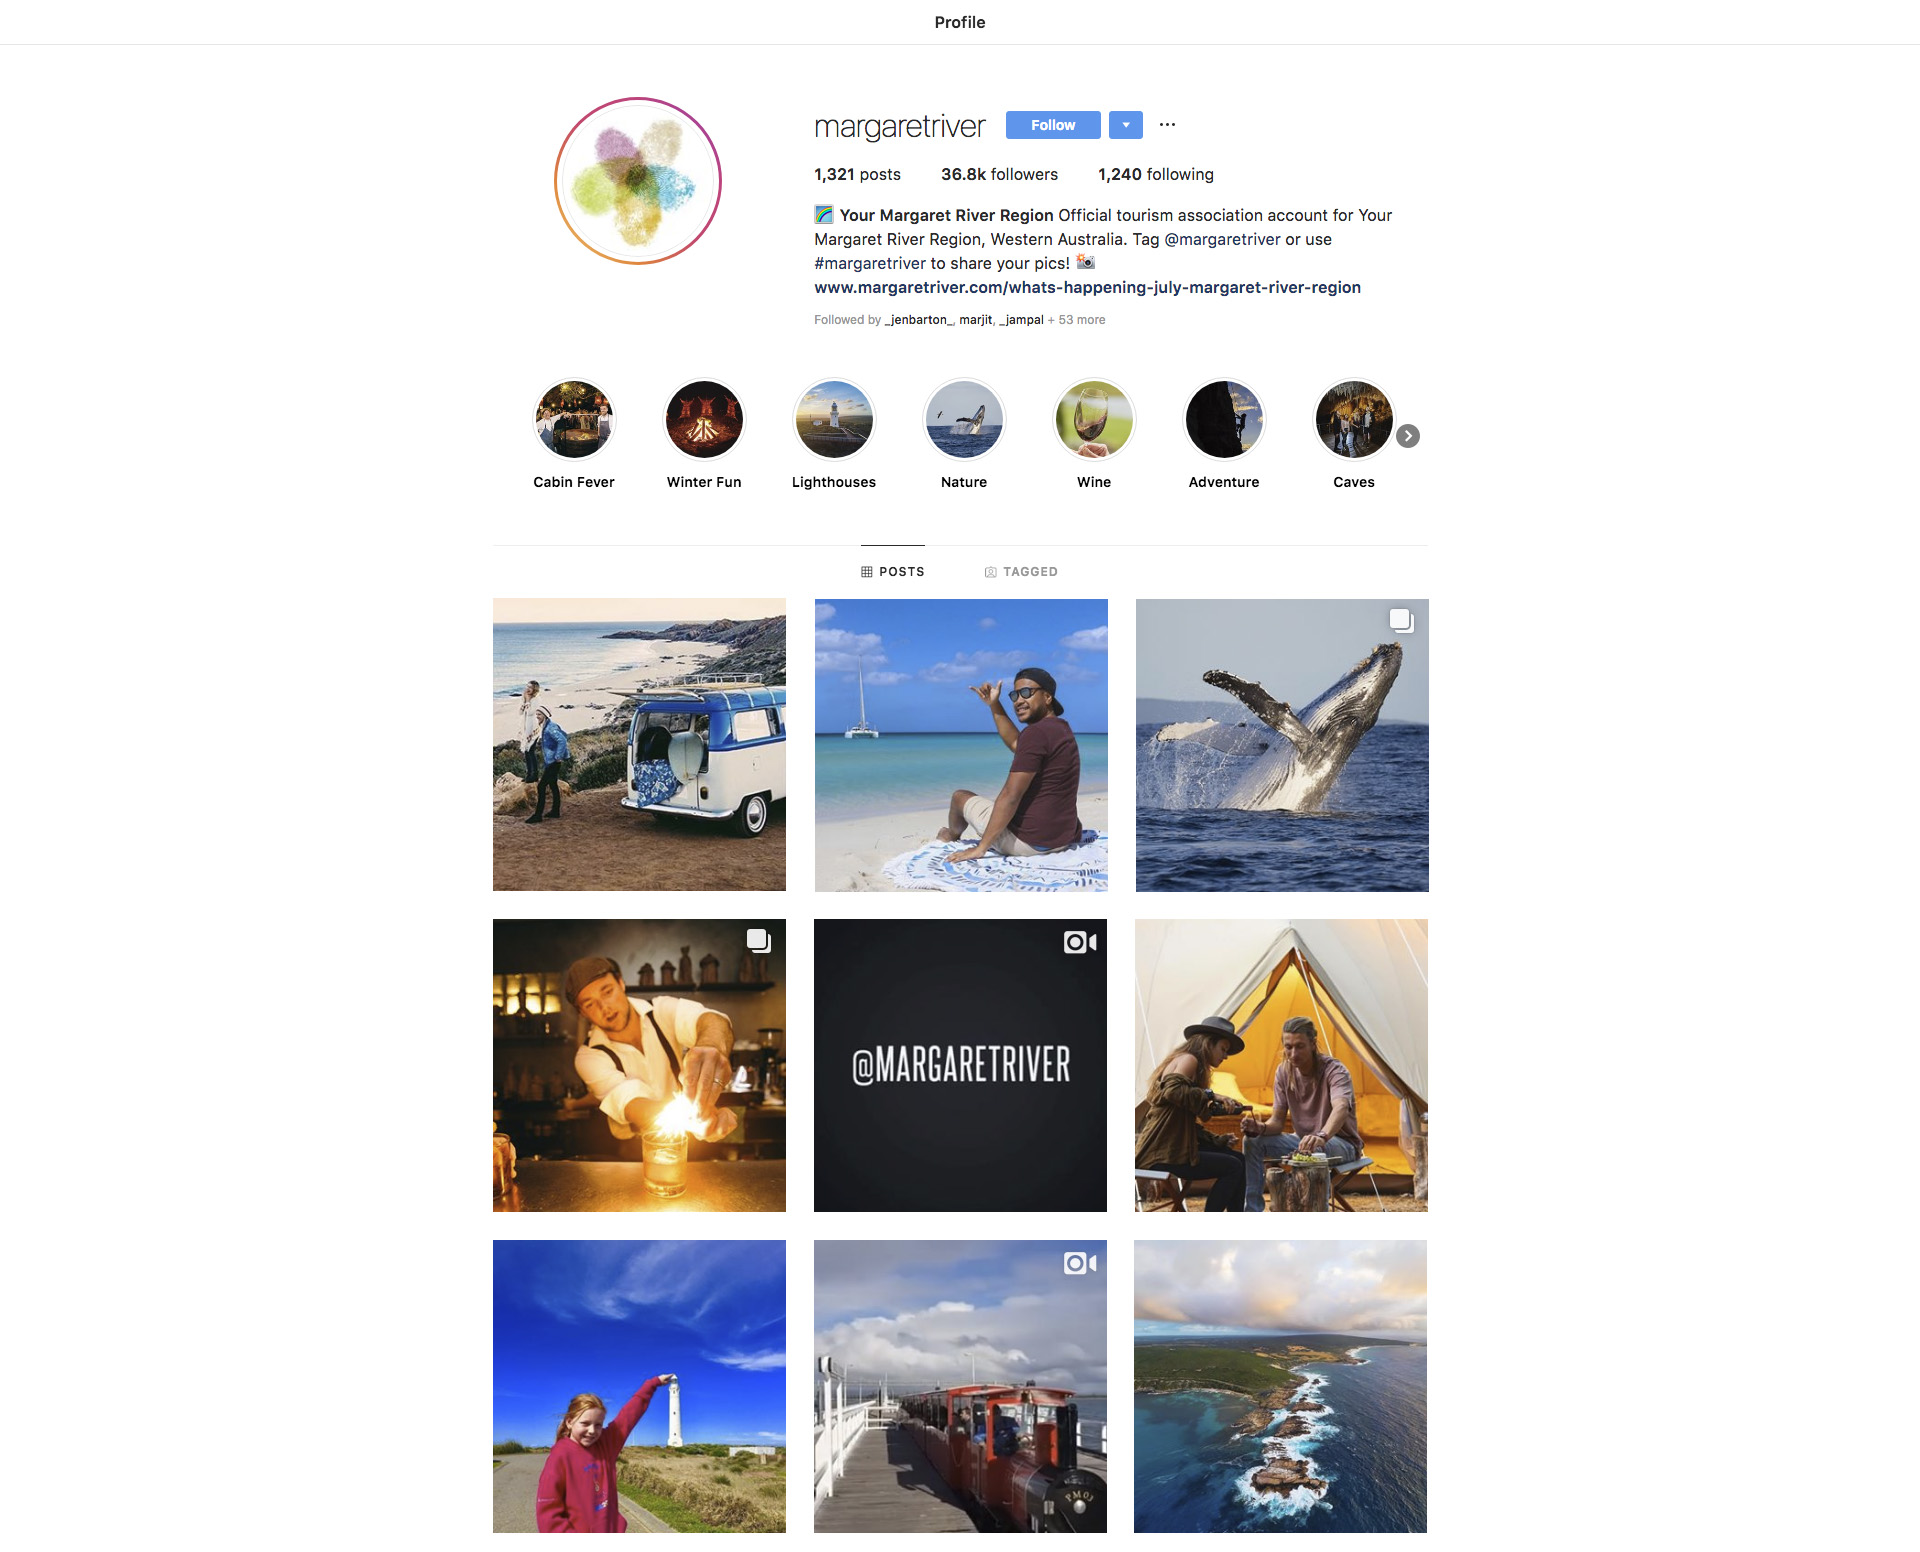 screencapture-instagram-margaretriver-2018-07-13-09_37_02.jpg